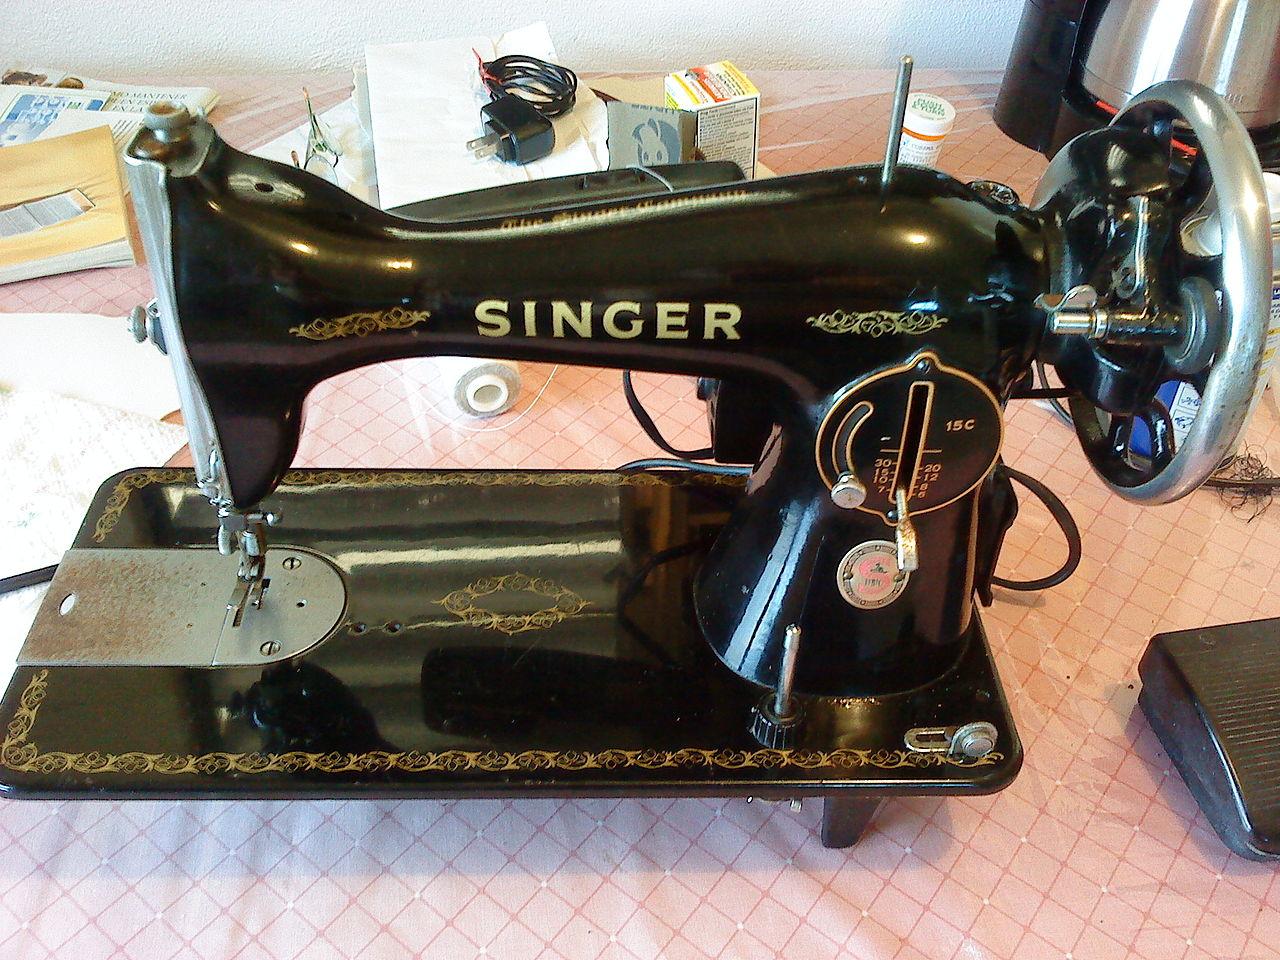 File:Maquina de coser singer la negrita 01.JPG - Wikimedia